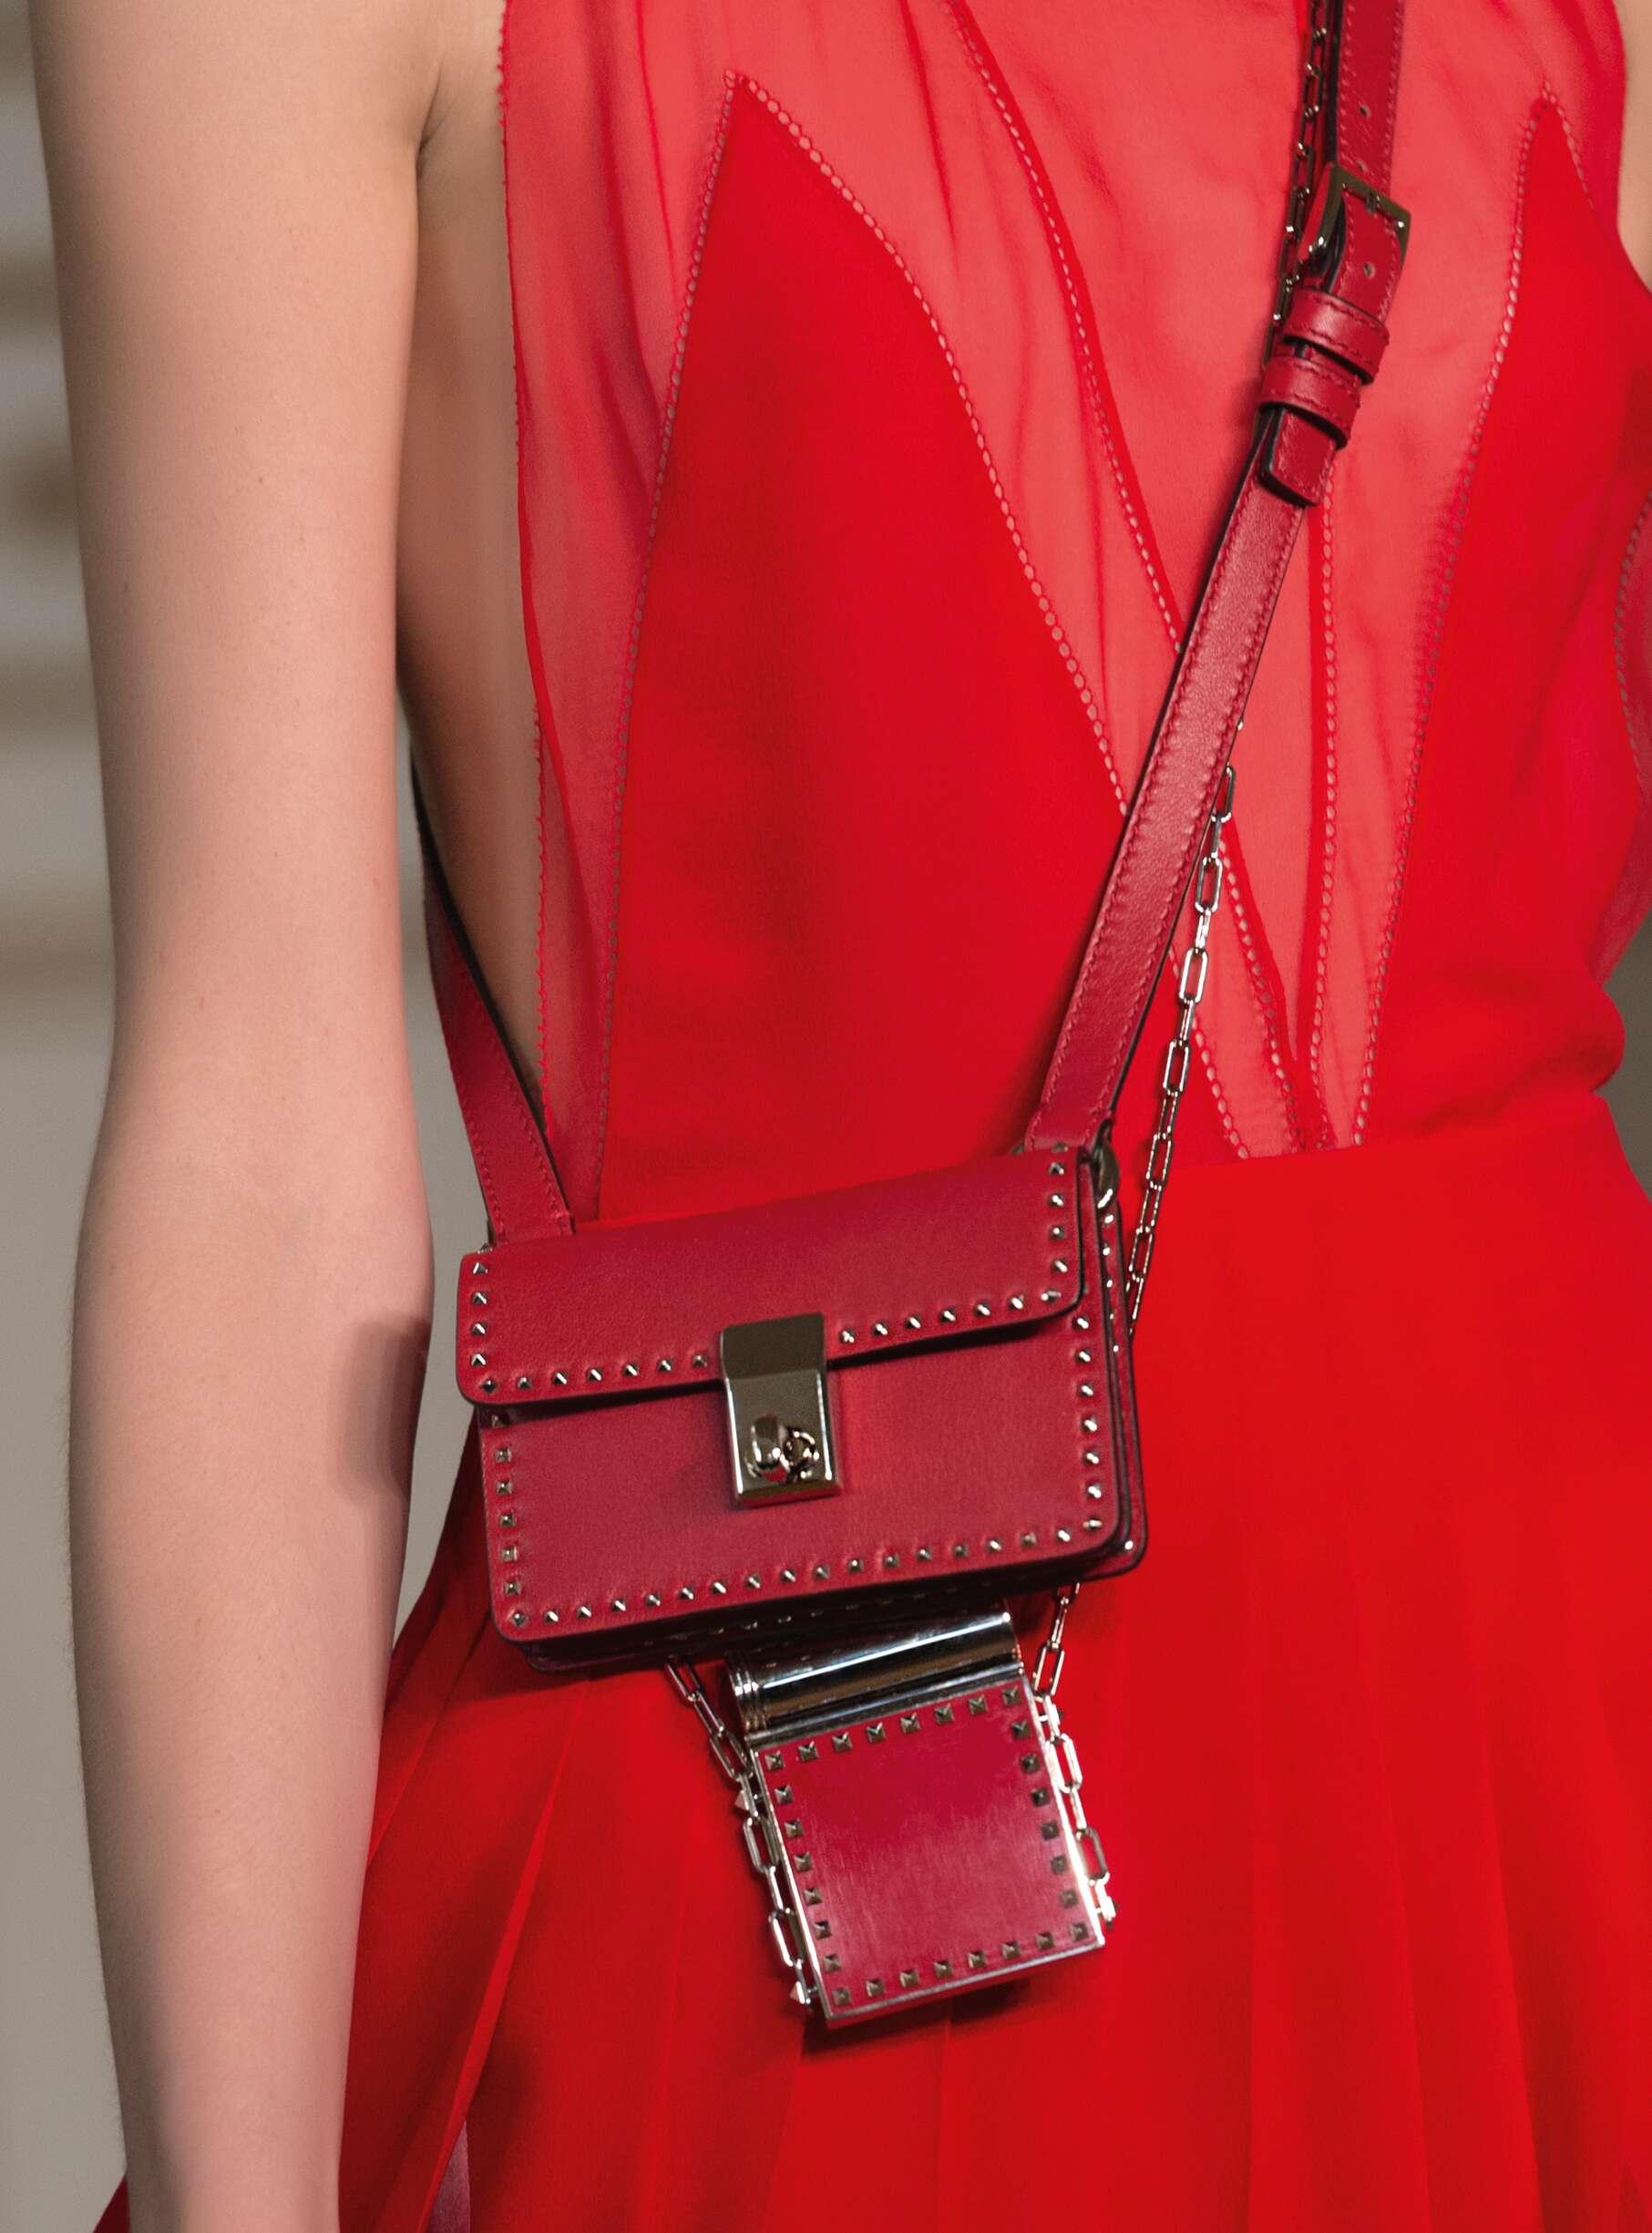 Bag 2017 Fashion Trends Valentino